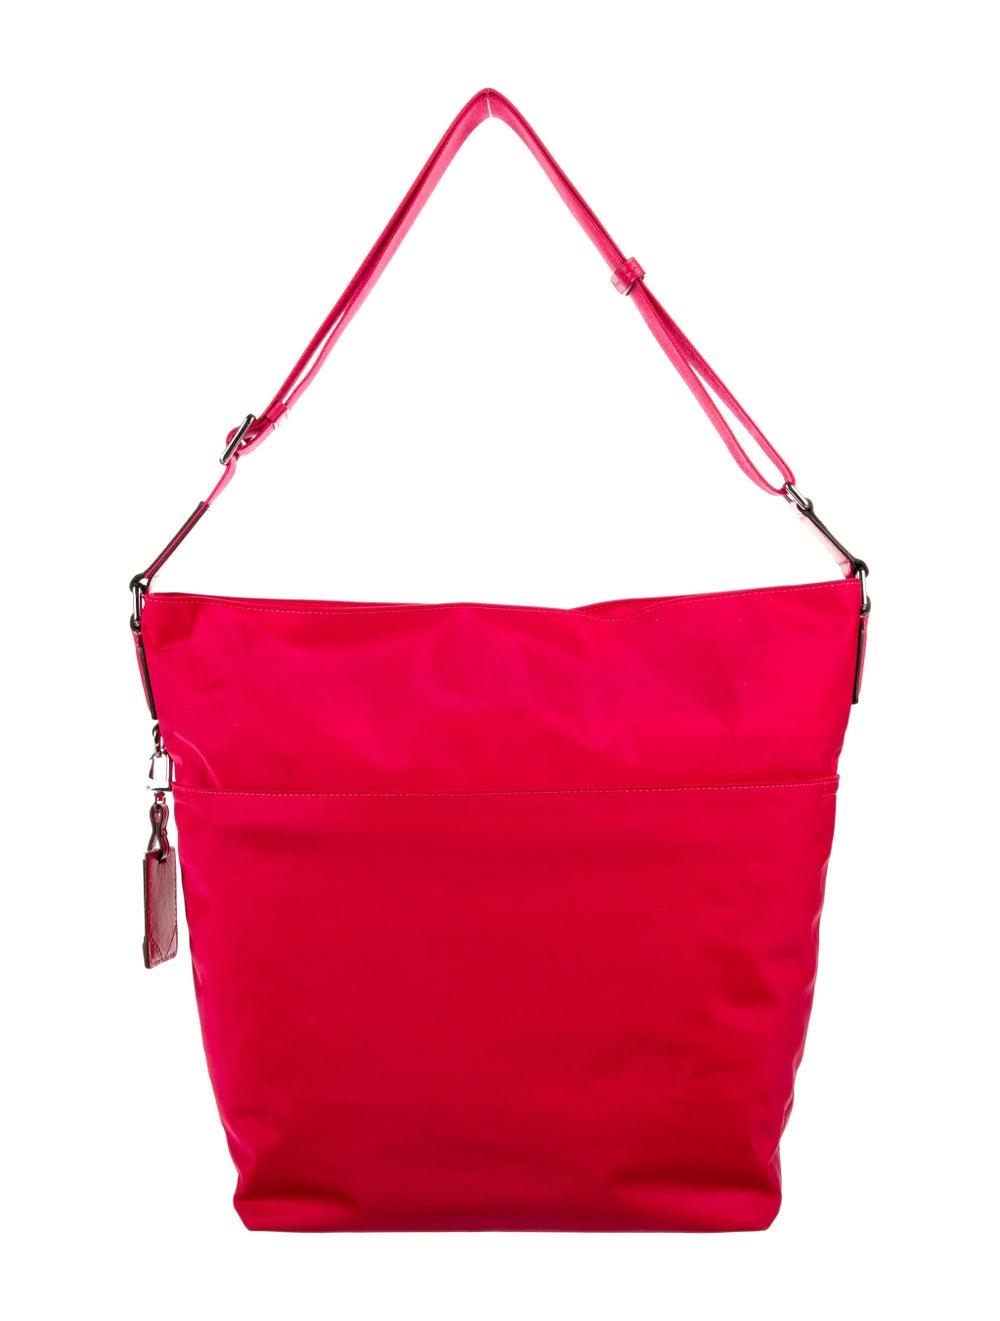 Tumi Nylon Shoulder Bag Pink - image 4